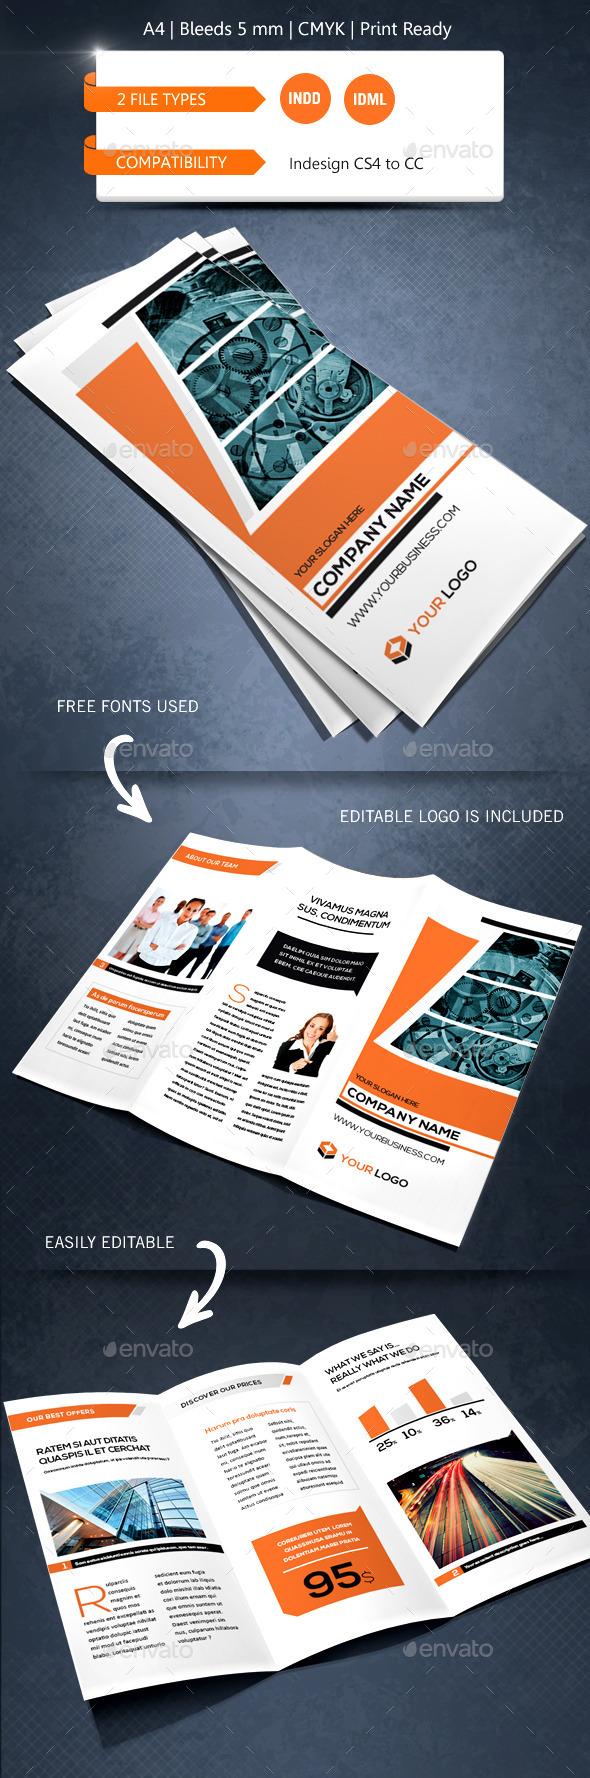 Creative & Corporate Trifold Brochure Template - Informational Brochures